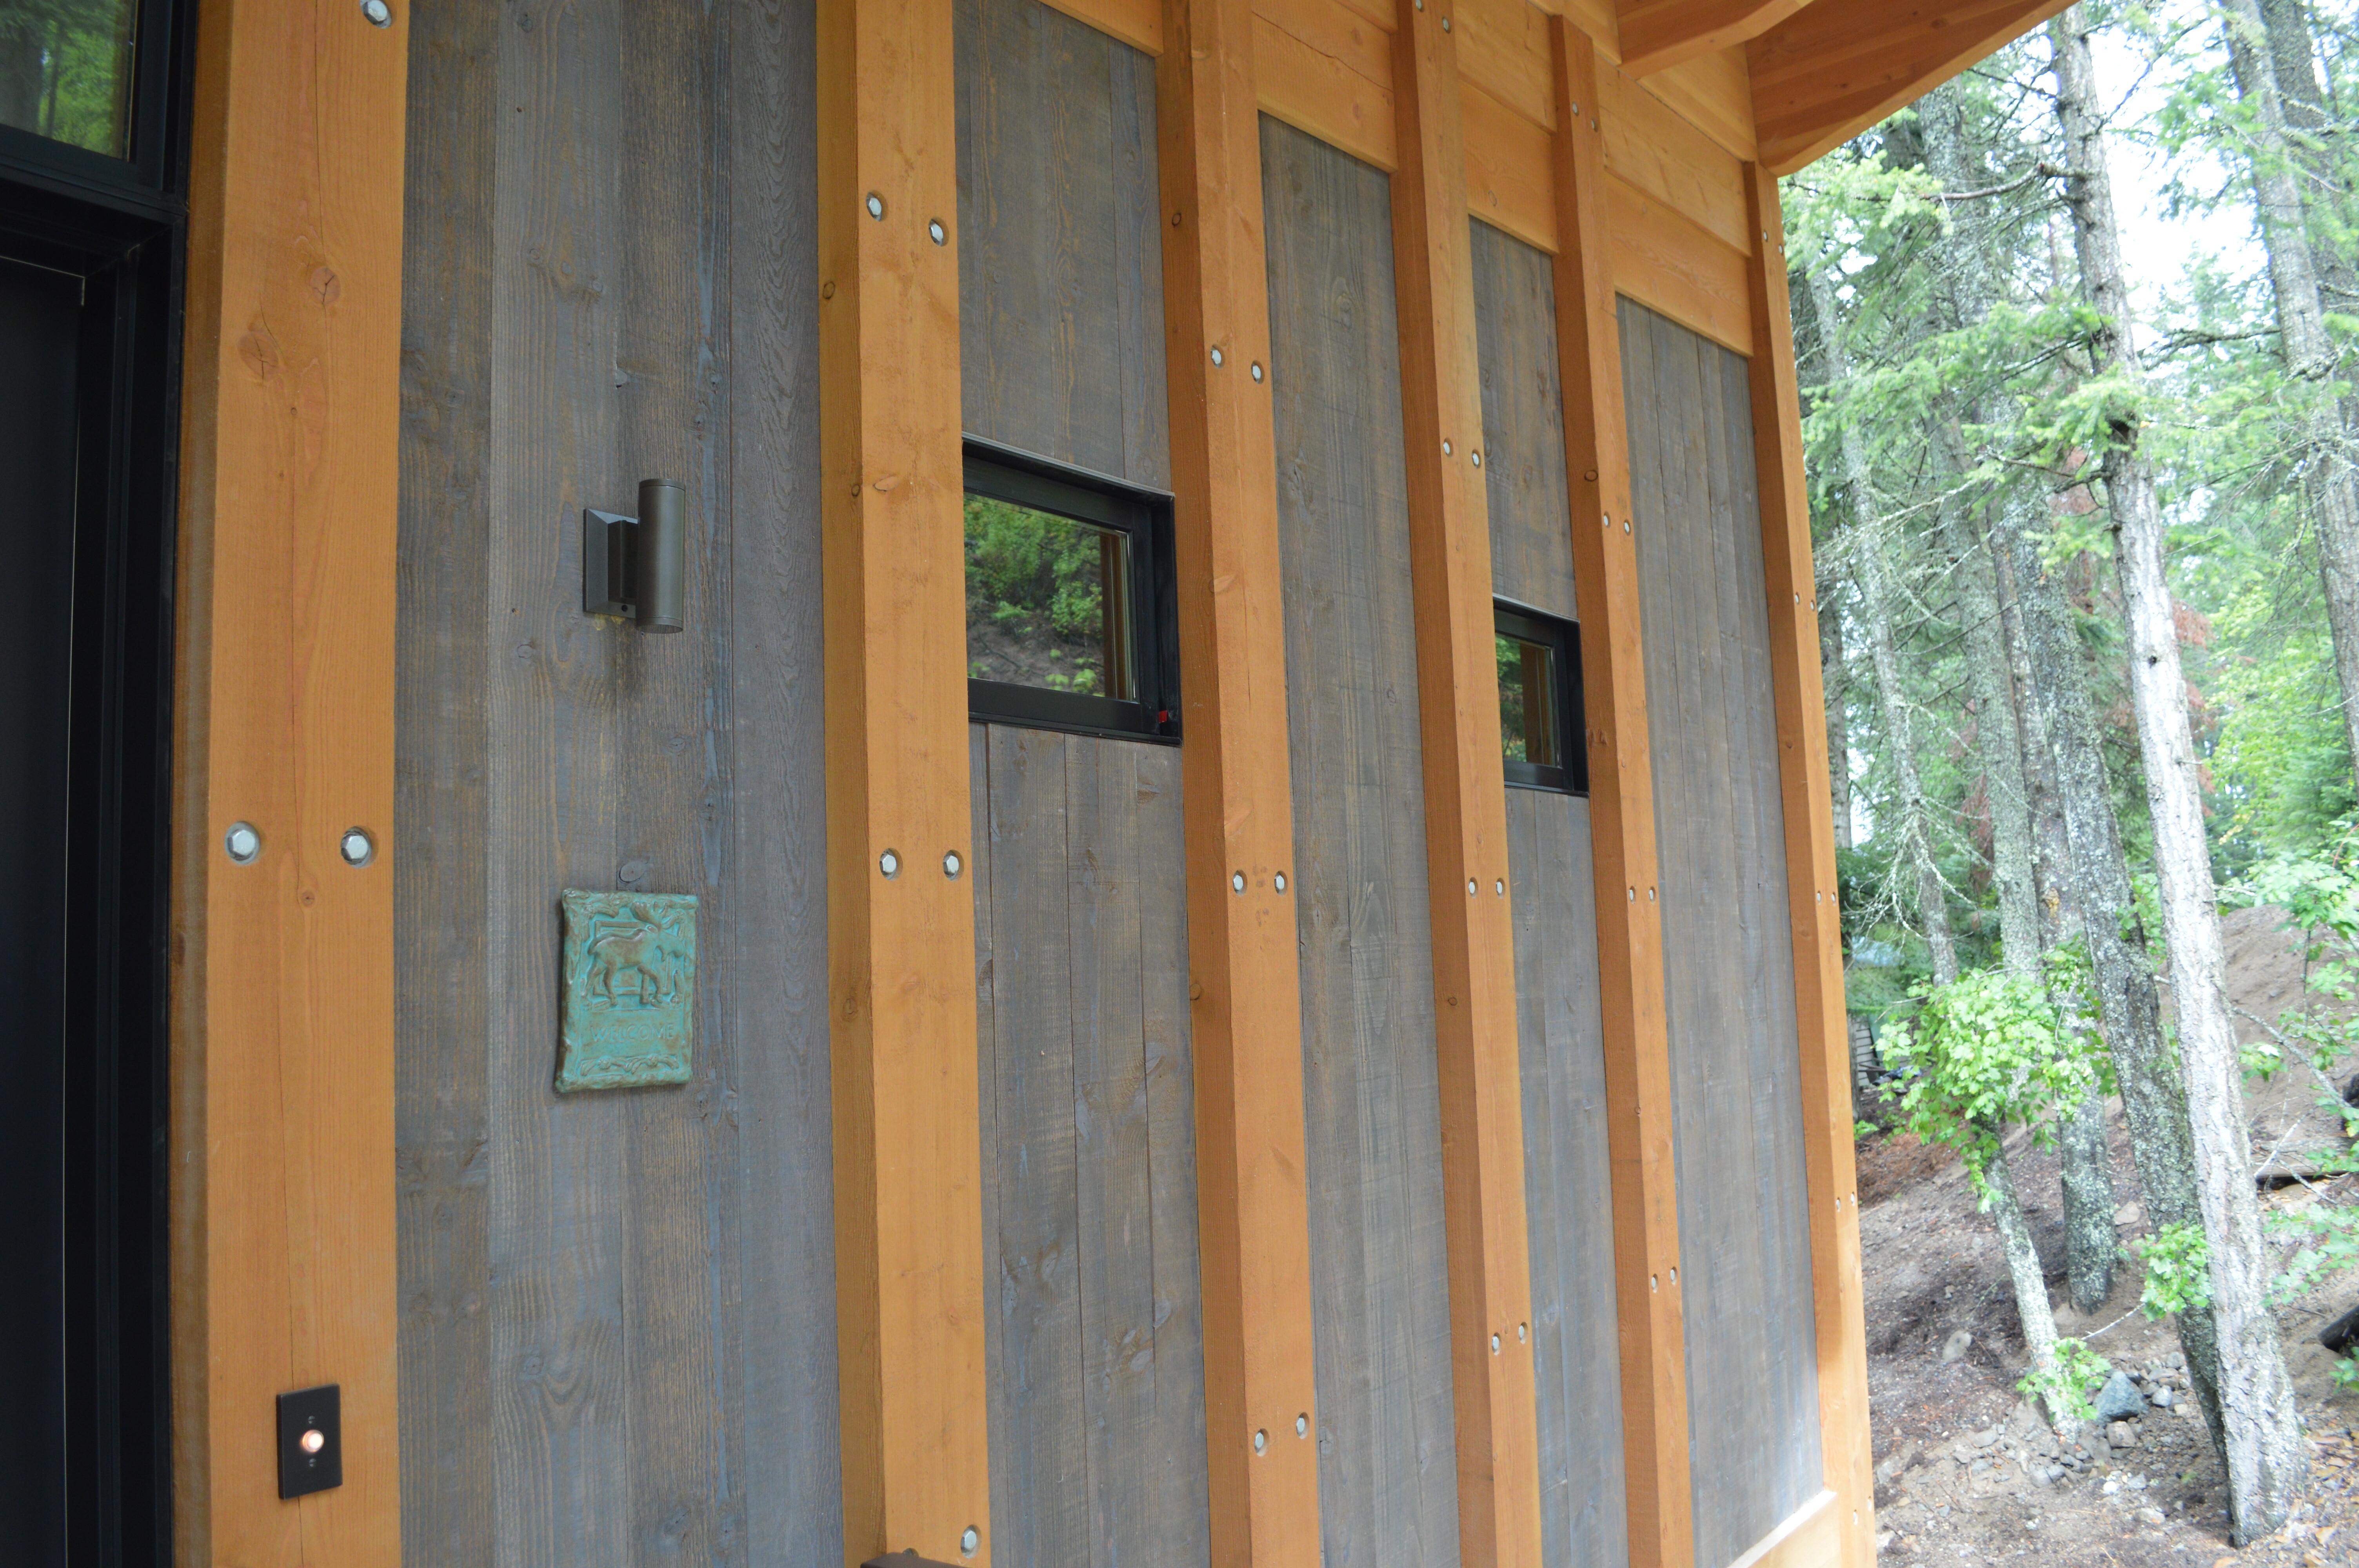 ranchwood™ Wood Siding and Interior Accents - Montana ... on Siding Ideas  id=56971